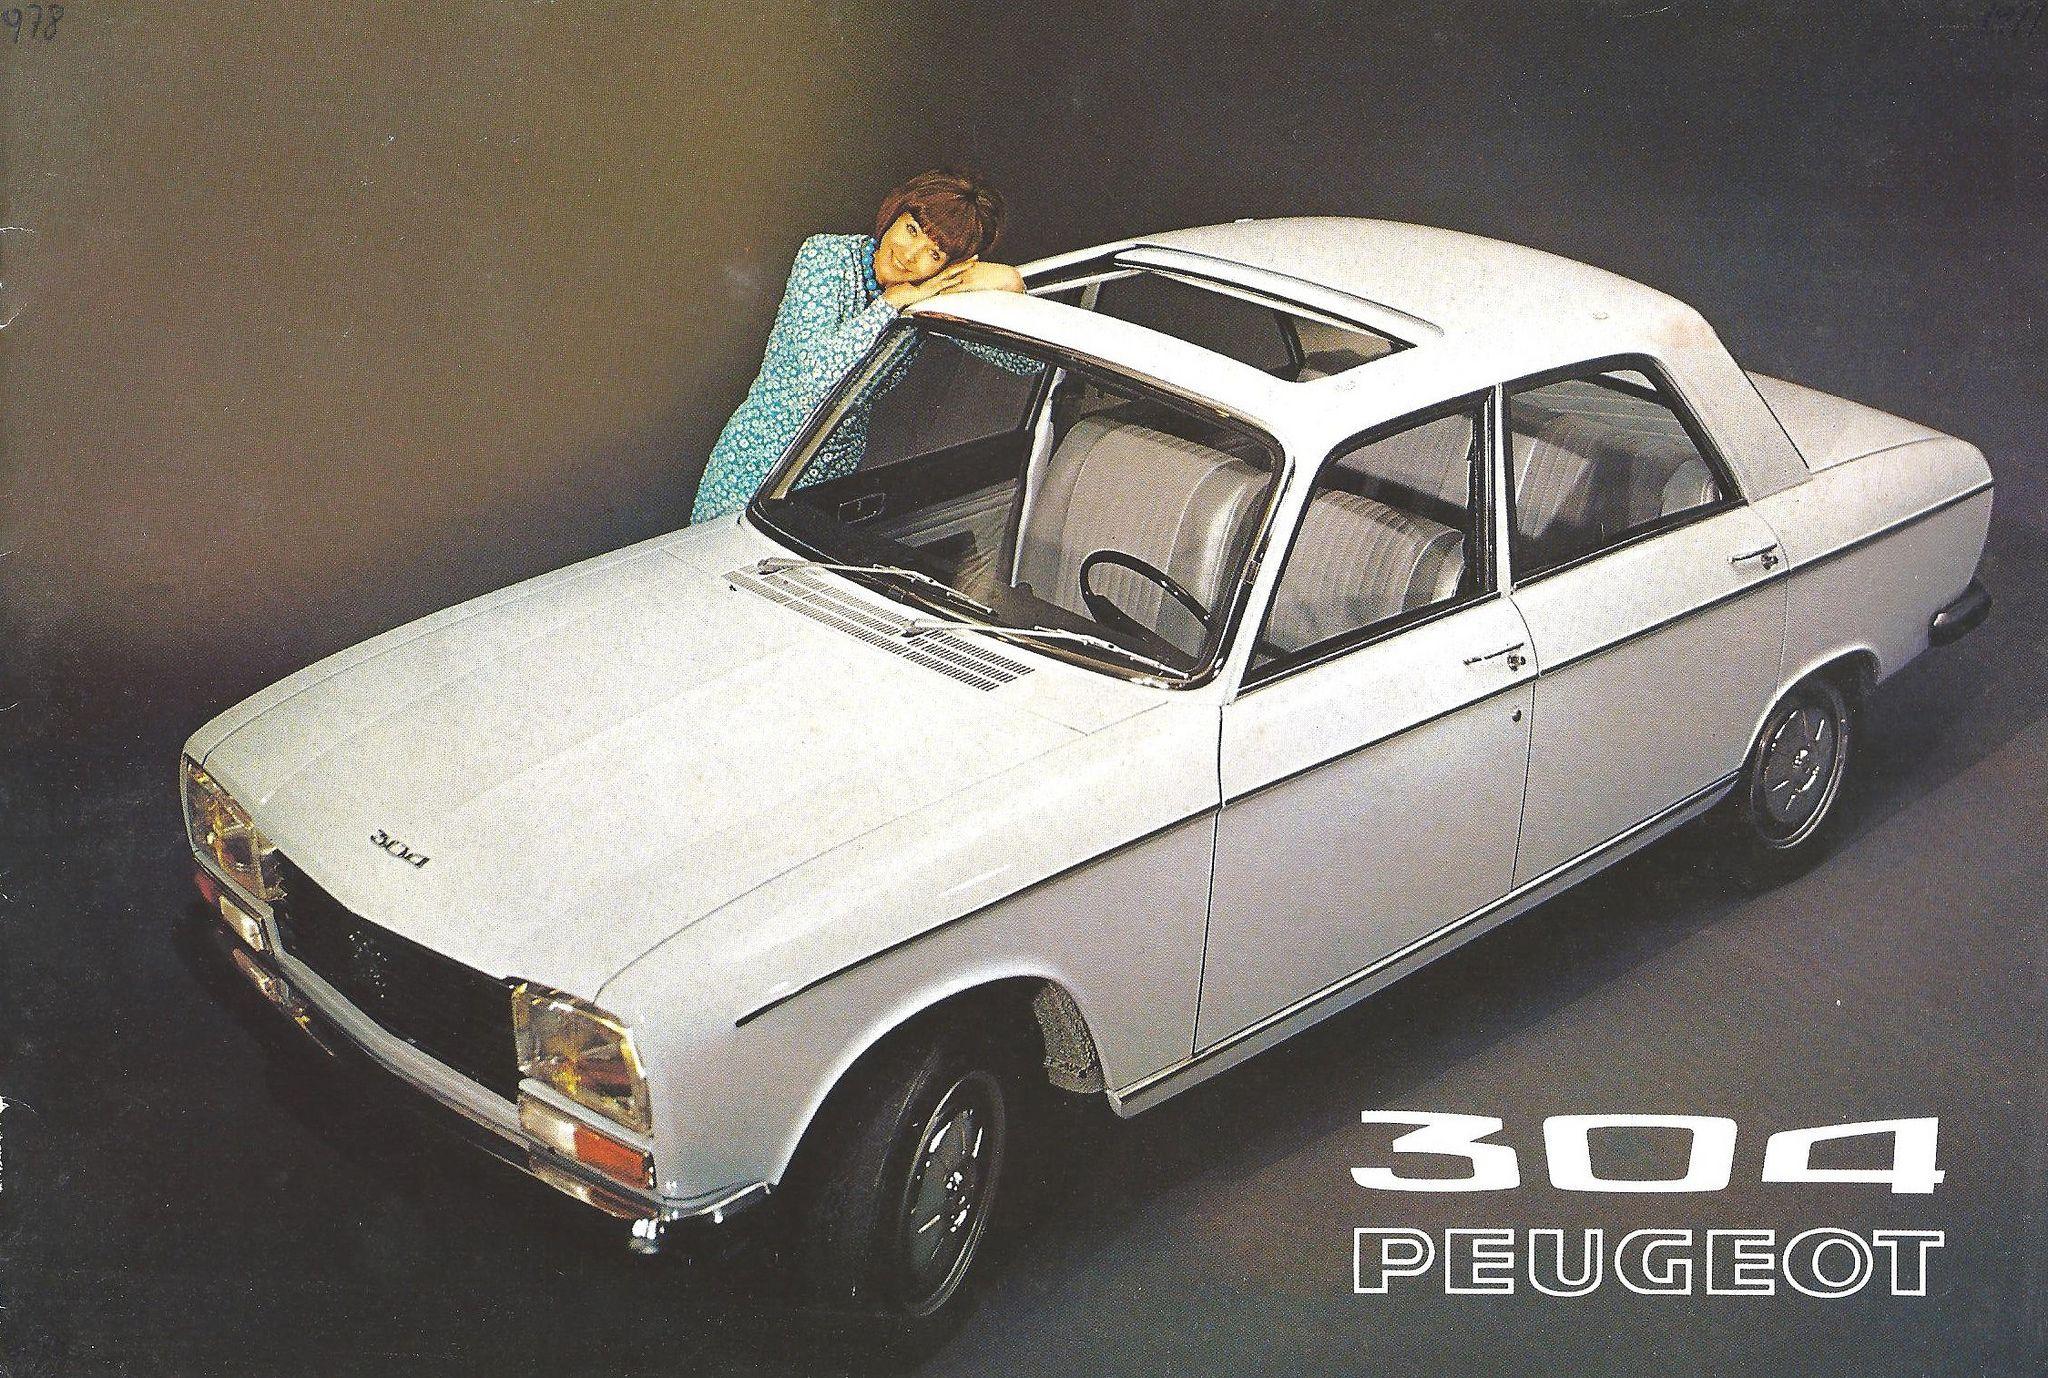 1971 Peugeot 304 Peugeot, Peugeot france, Car advertising